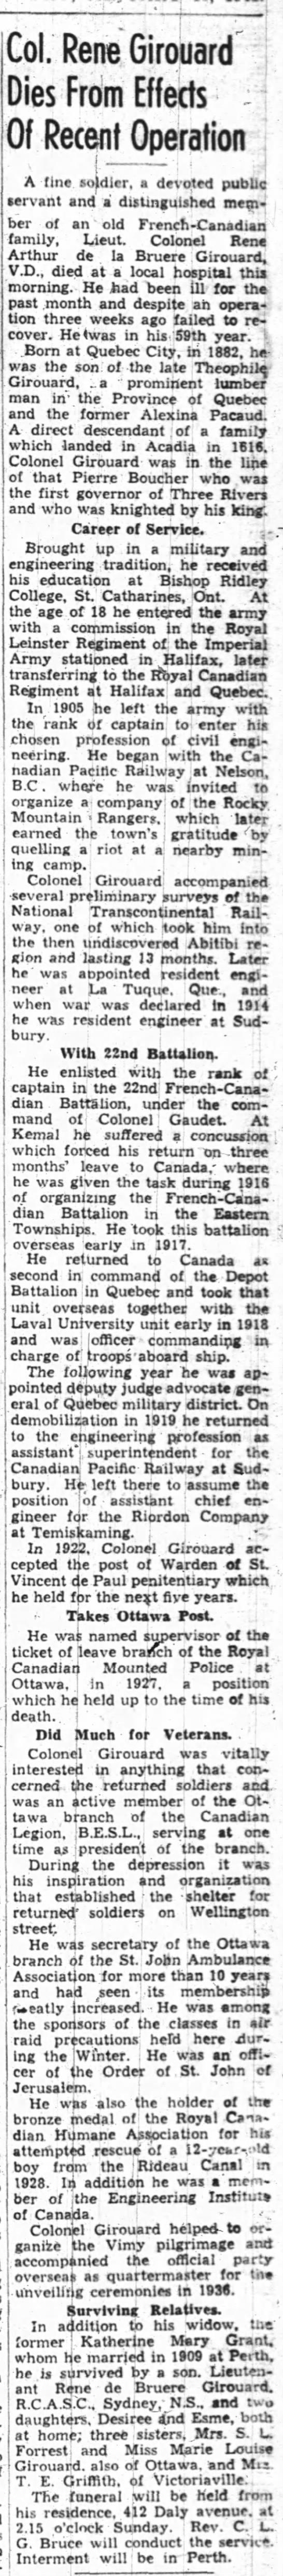 Ottawa Journal, 10 Jan 41 -